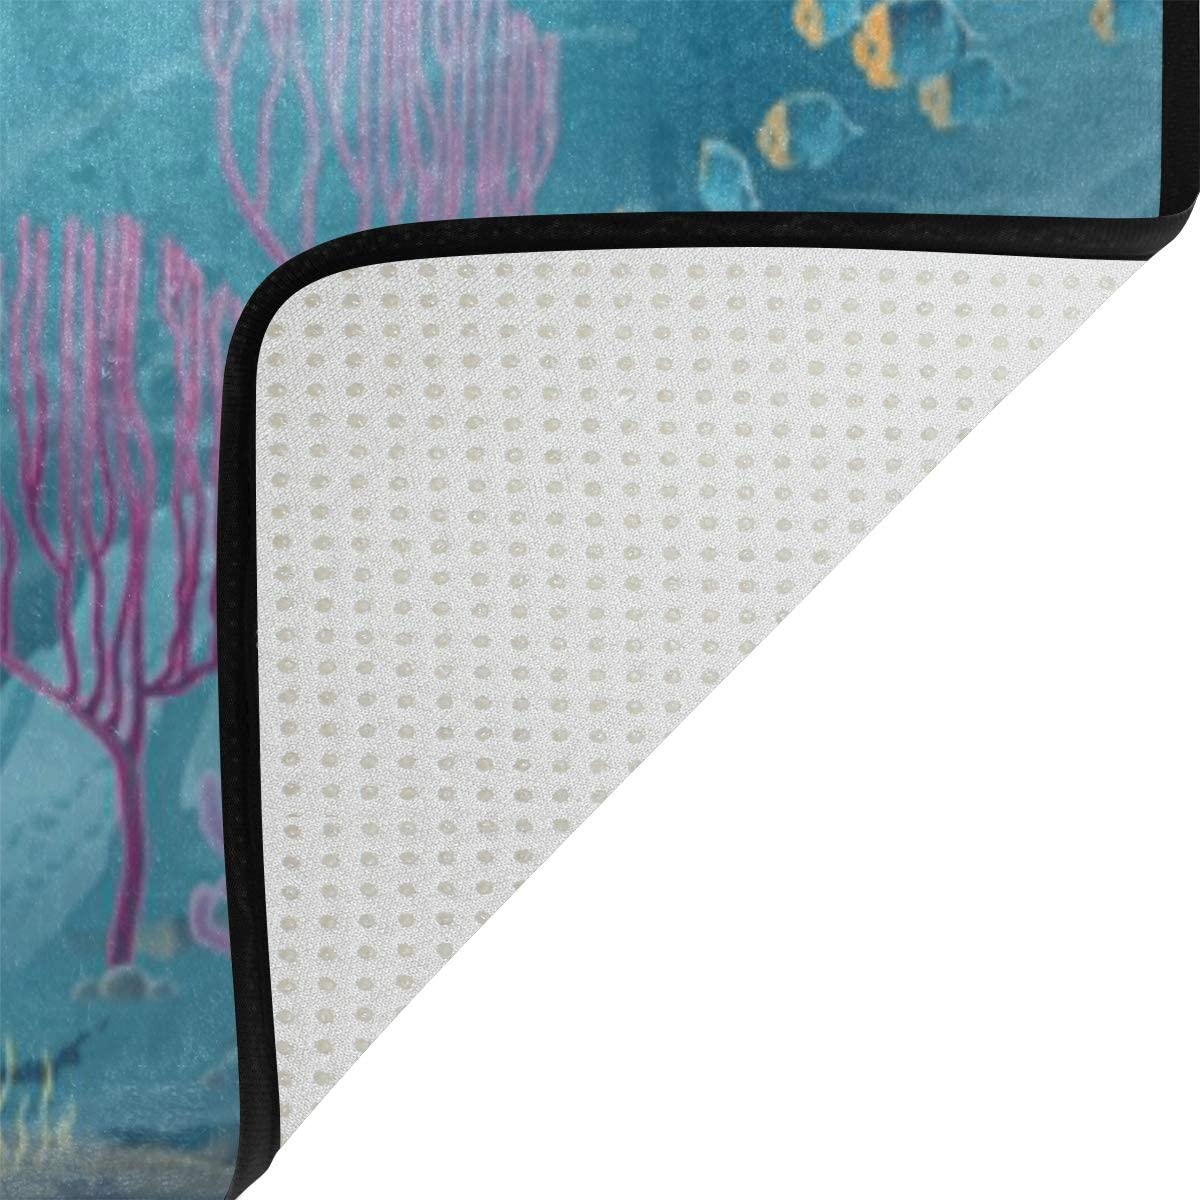 Naanle Mermaid Dolphins Ocean Sea Non Slip Area Rug for Living Dinning Room Bedroom Kitchen Mermaid Dolphins Nursery Rug Floor Carpet Yoga Mat 1.7 x 2.6 ft 50 x 80 cm